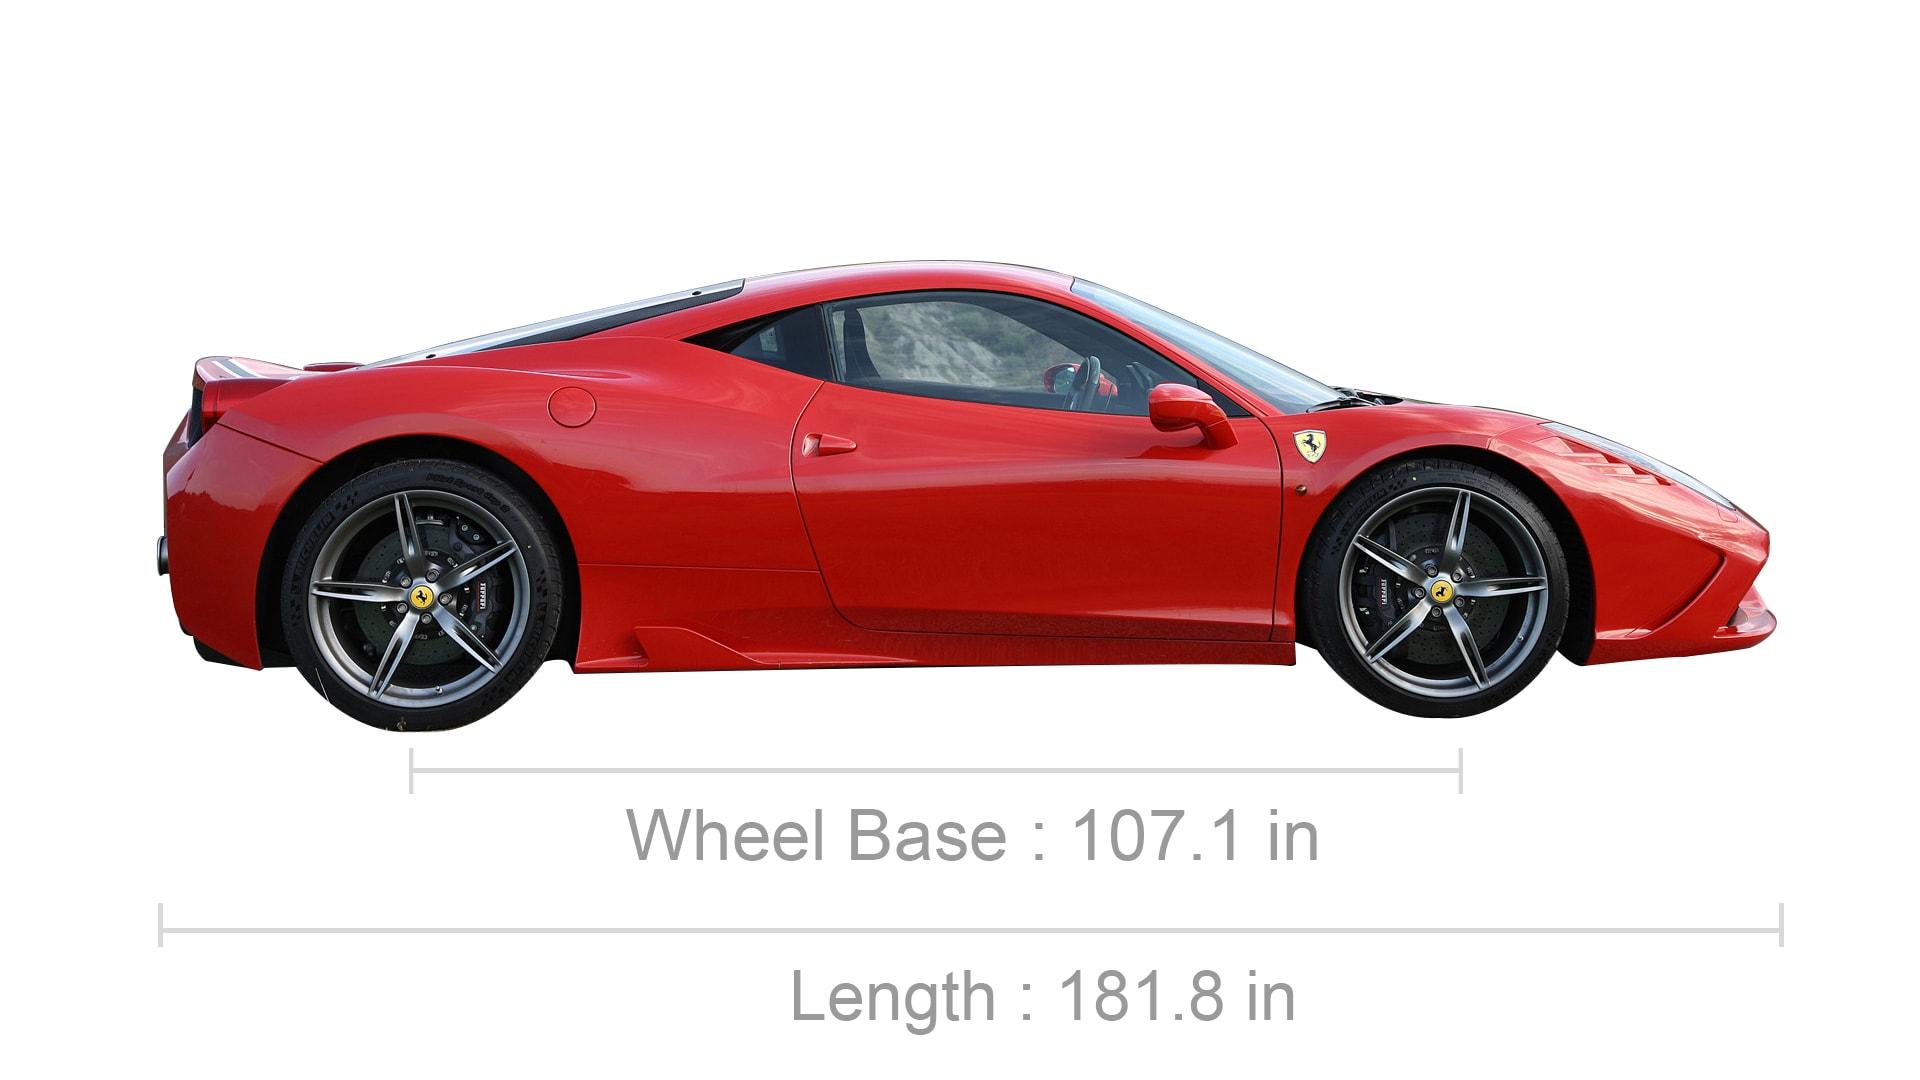 Ferrari 458 dimensions